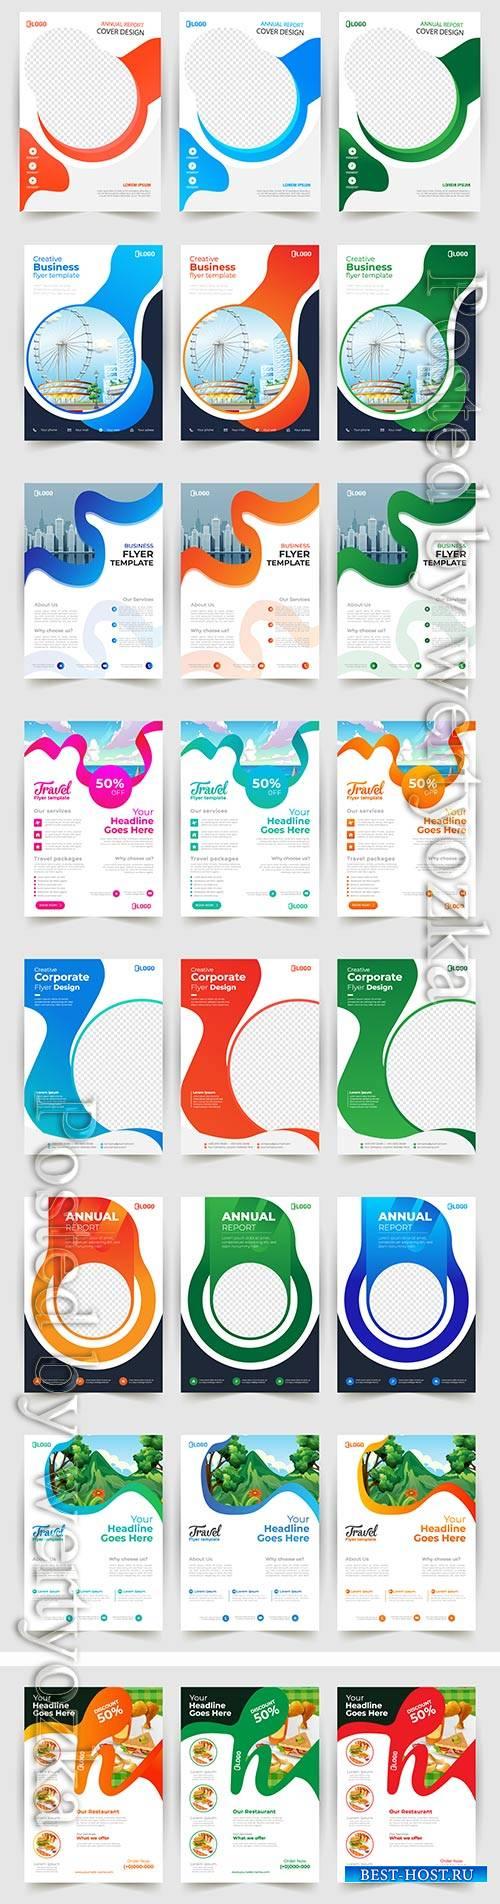 Business flyer template design, brochure vector illustration # 5